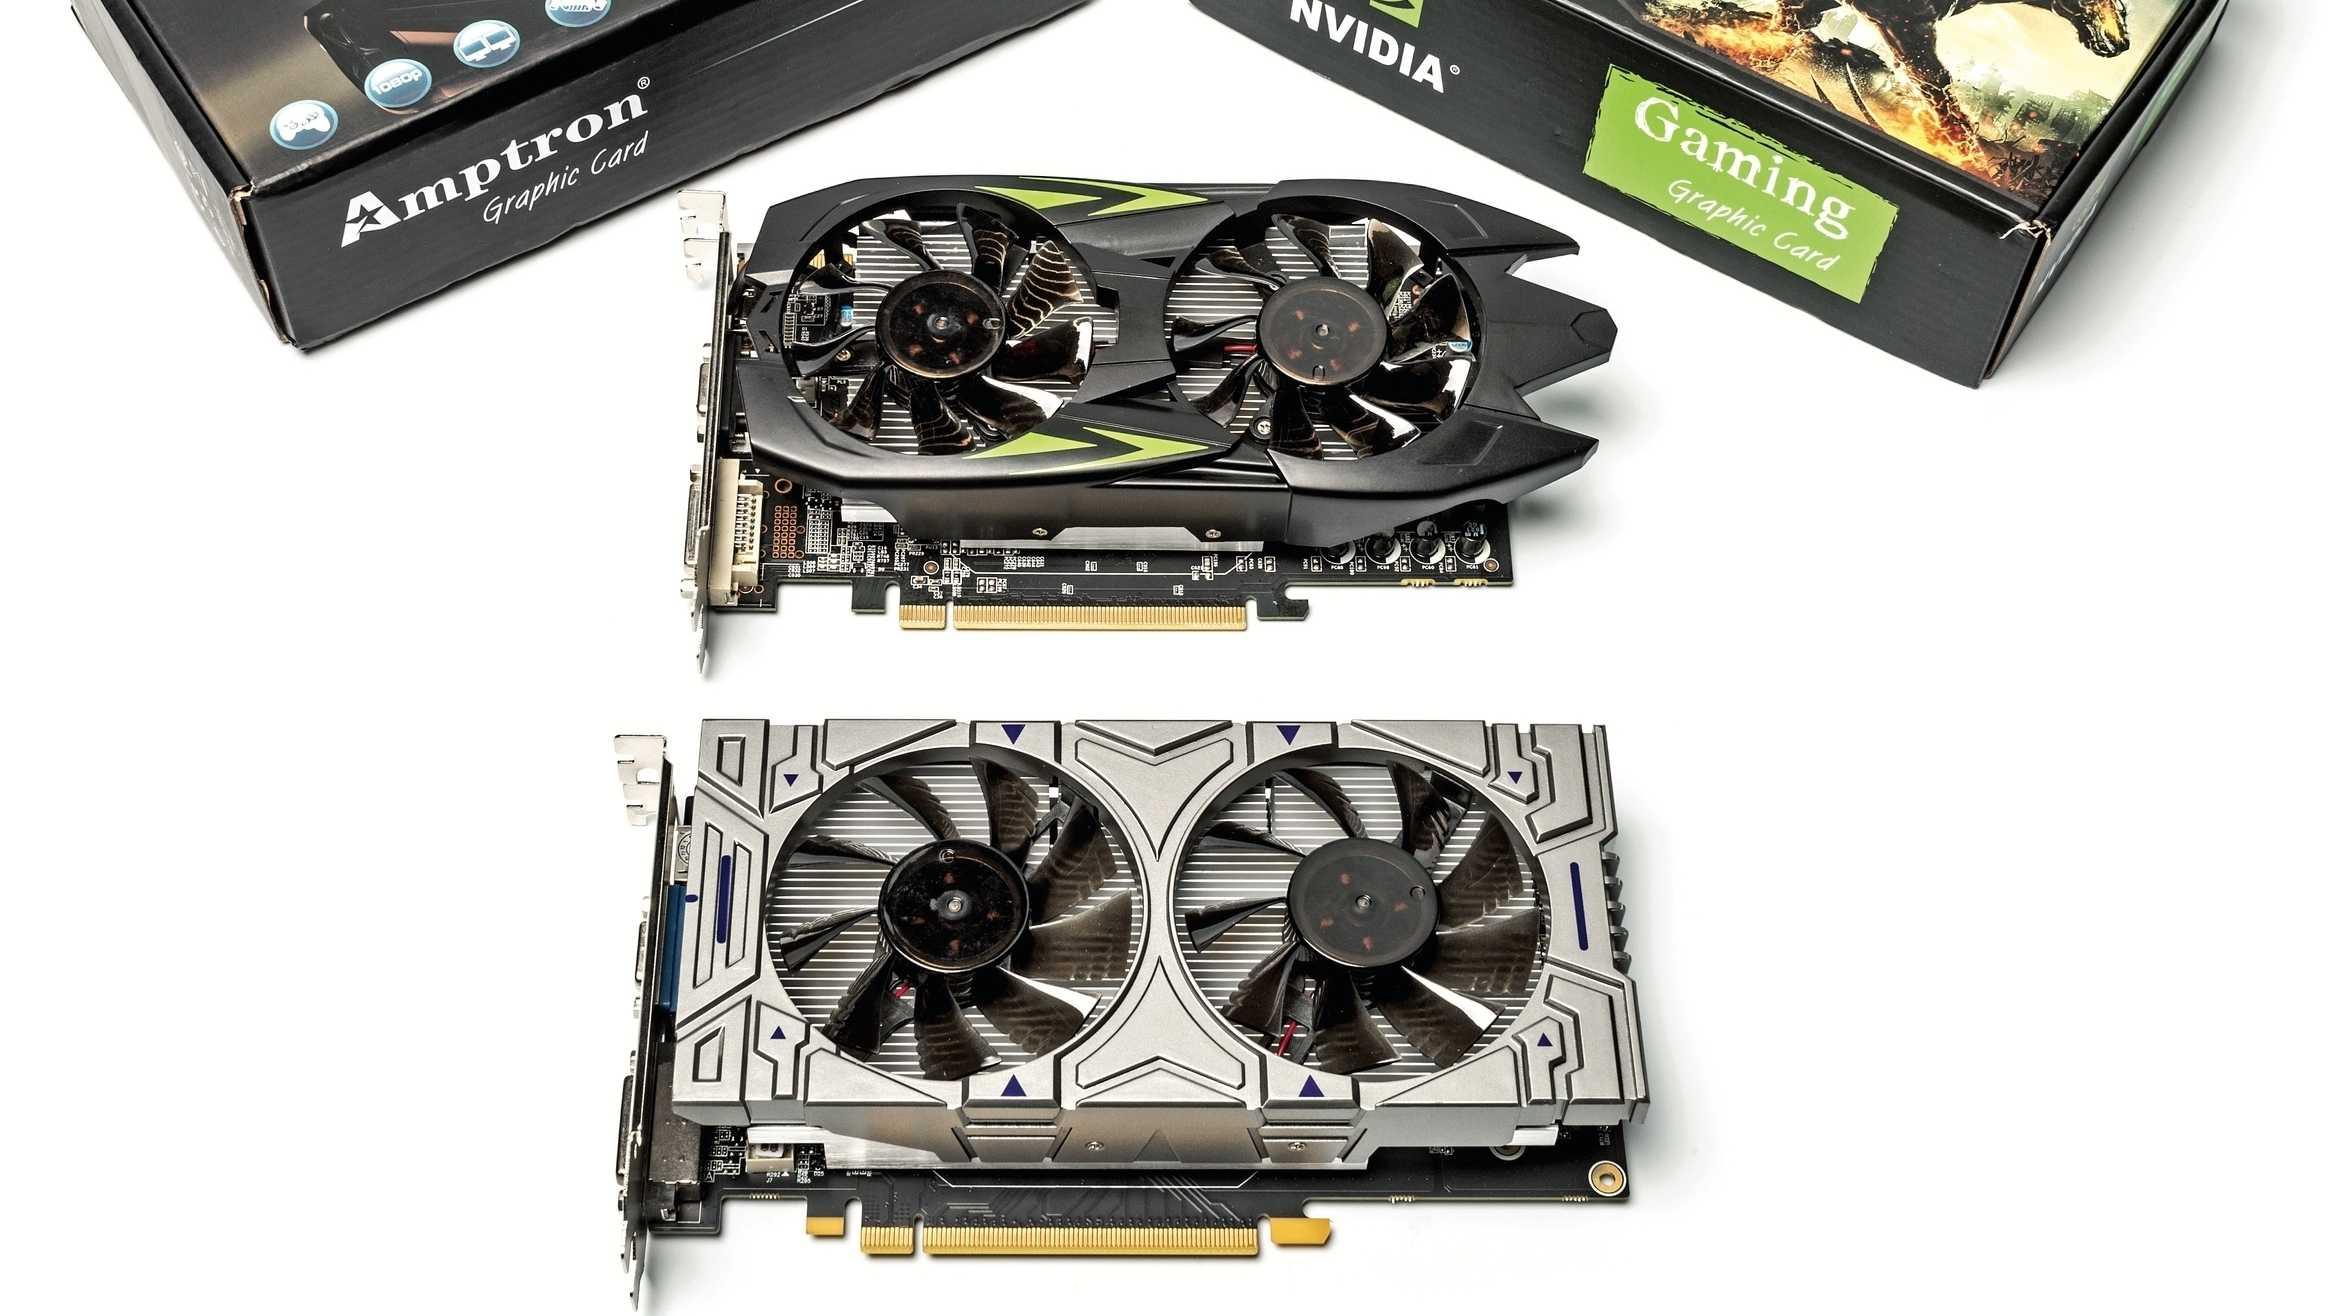 Massenhaft gefälschte Nvidia-Grafikkarten bei eBay: GeForce GTS 450 statt GTX 1060